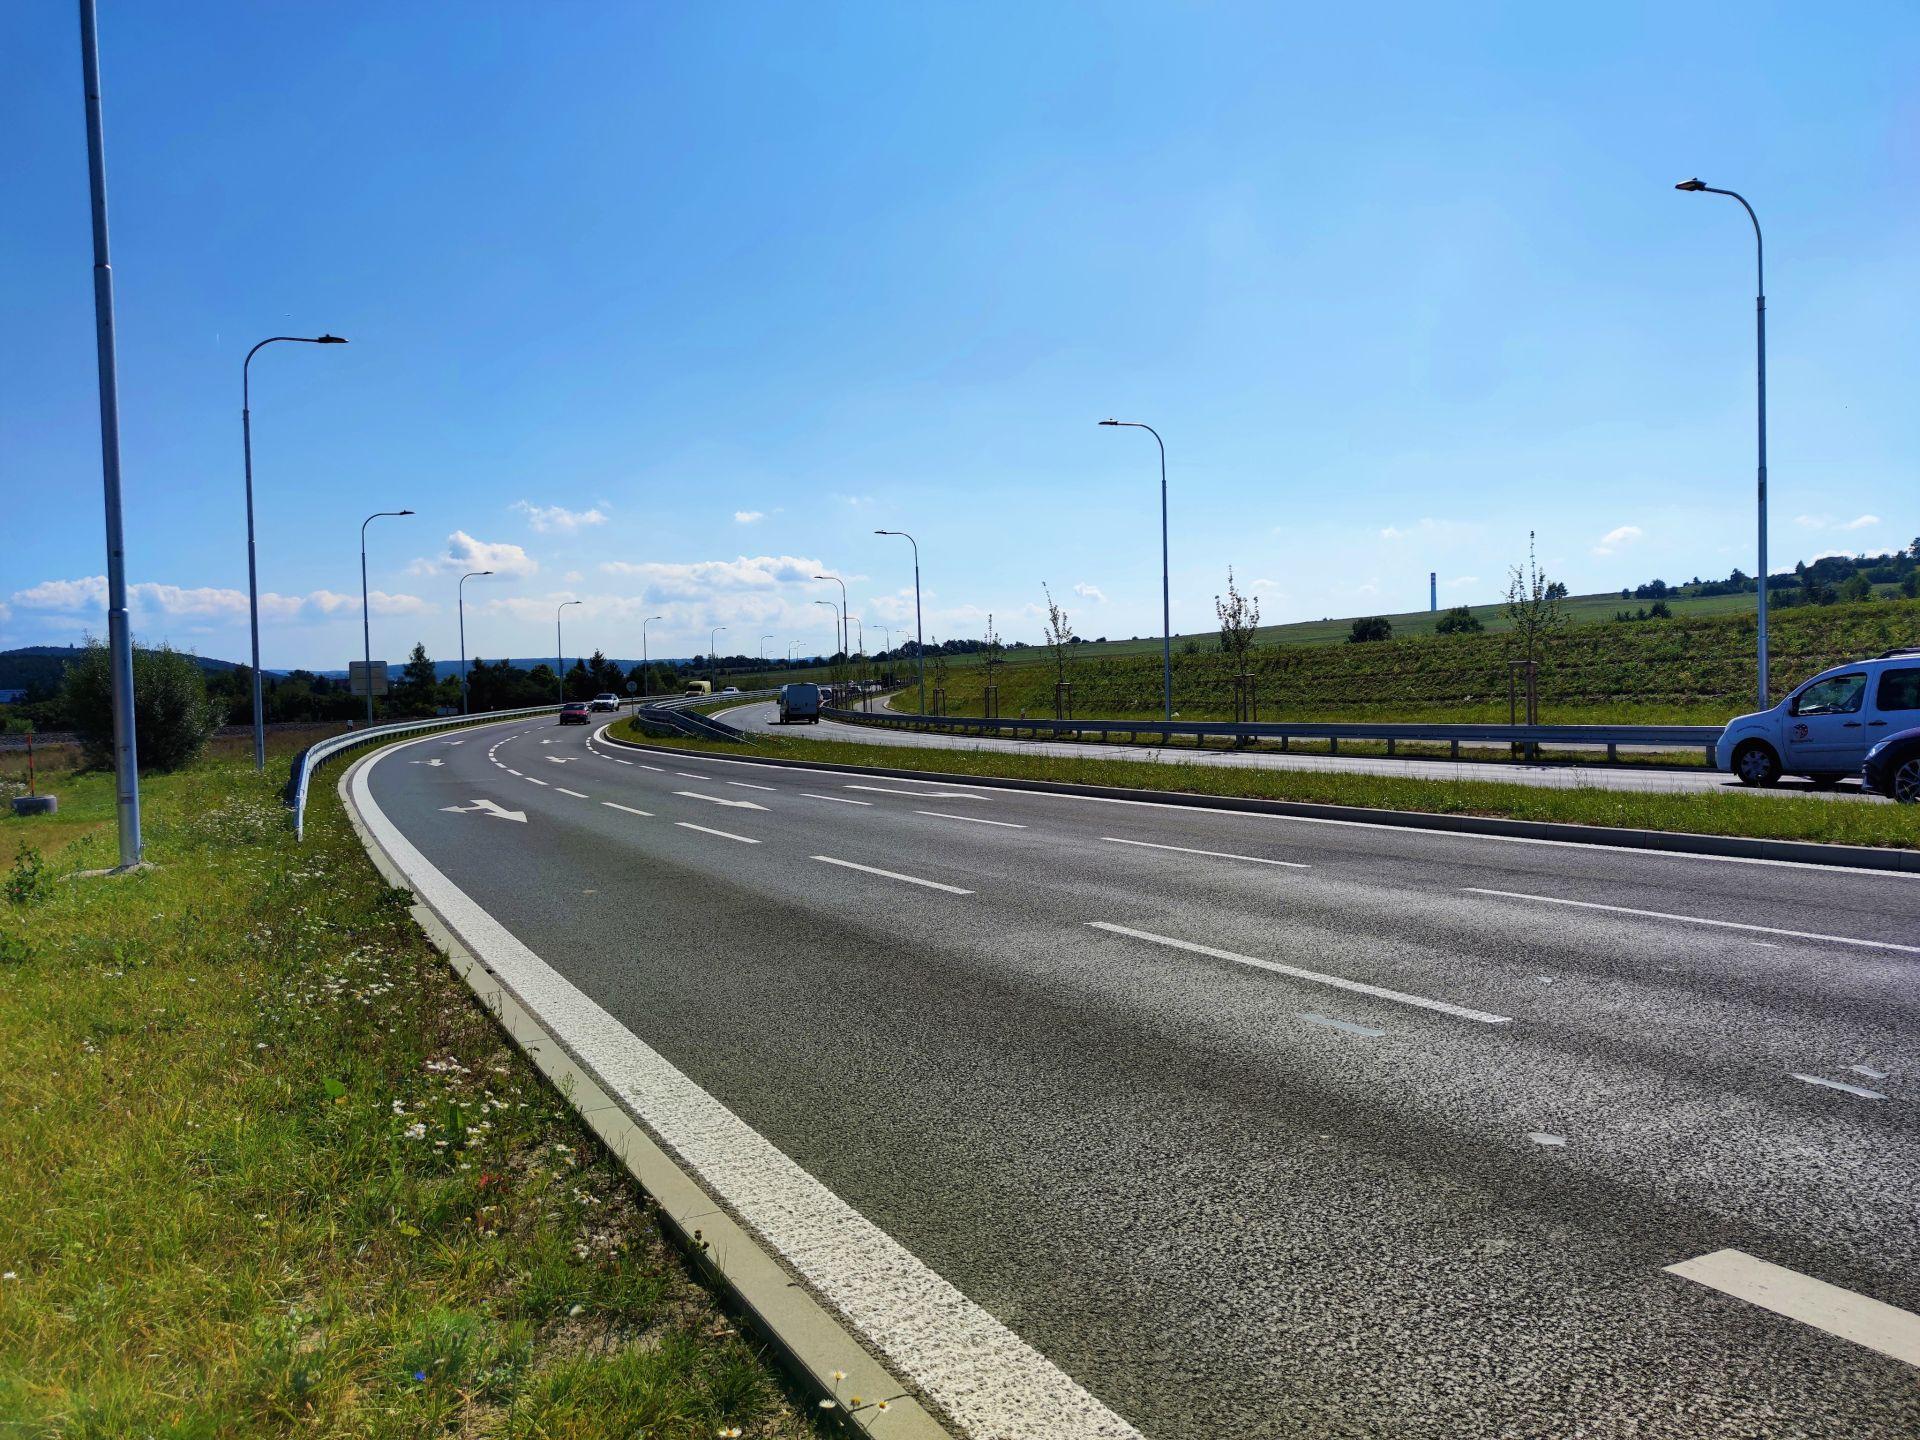 Nový úsek silnice I/20 v Plzni. Pramen: MDČR